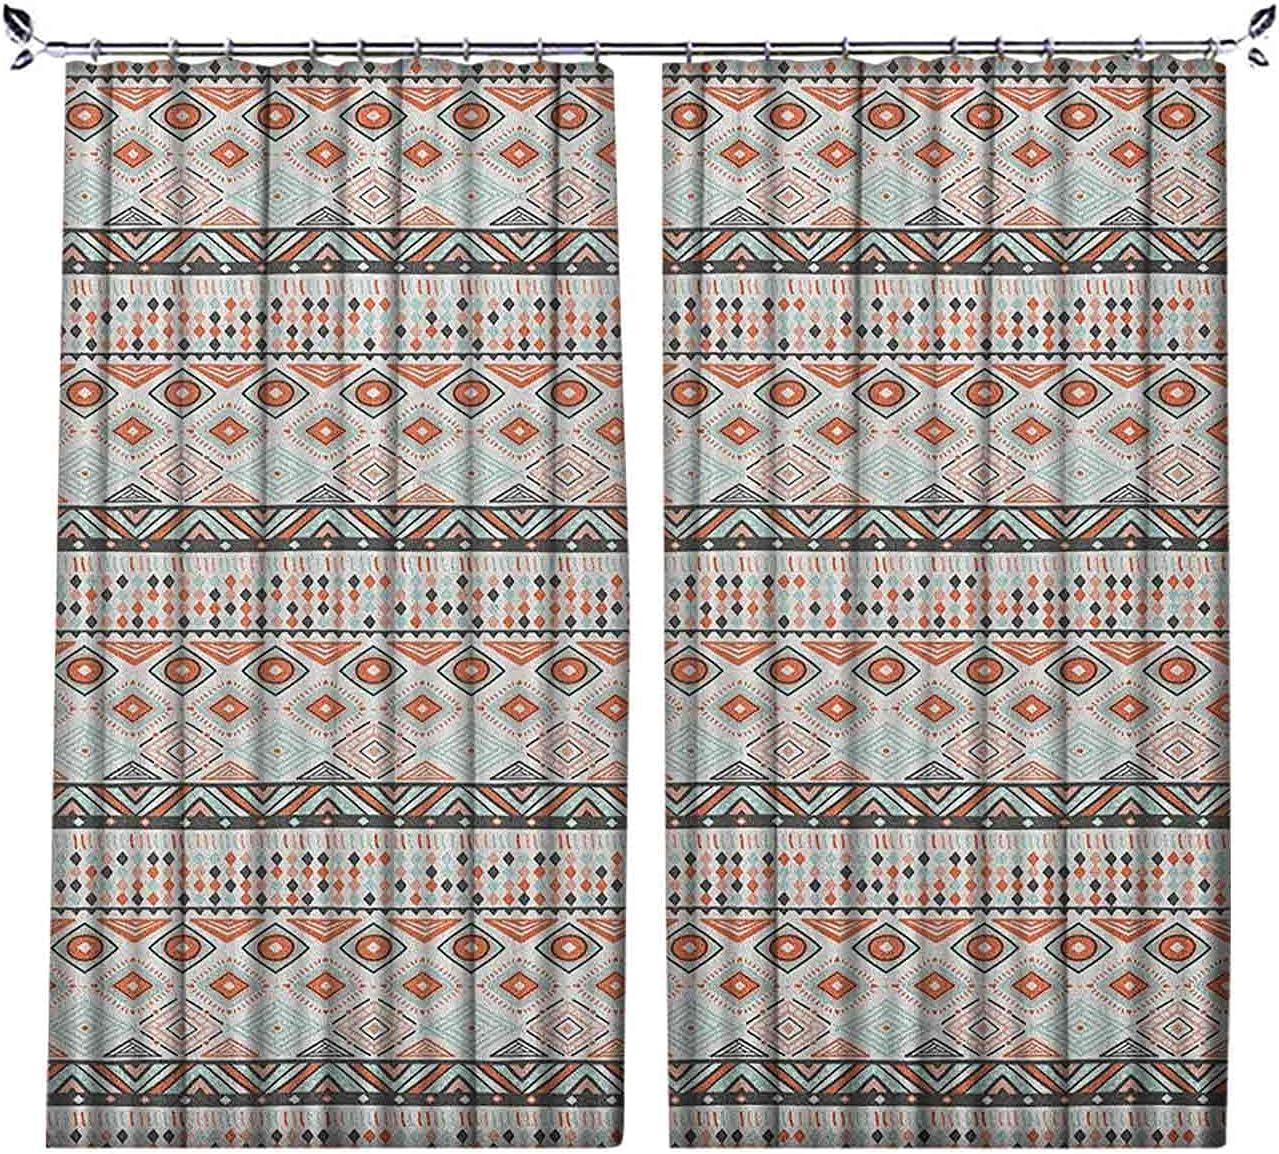 Kansas City Mall Pleated Heat Insulation Curtains Arrangement Rare Geometric